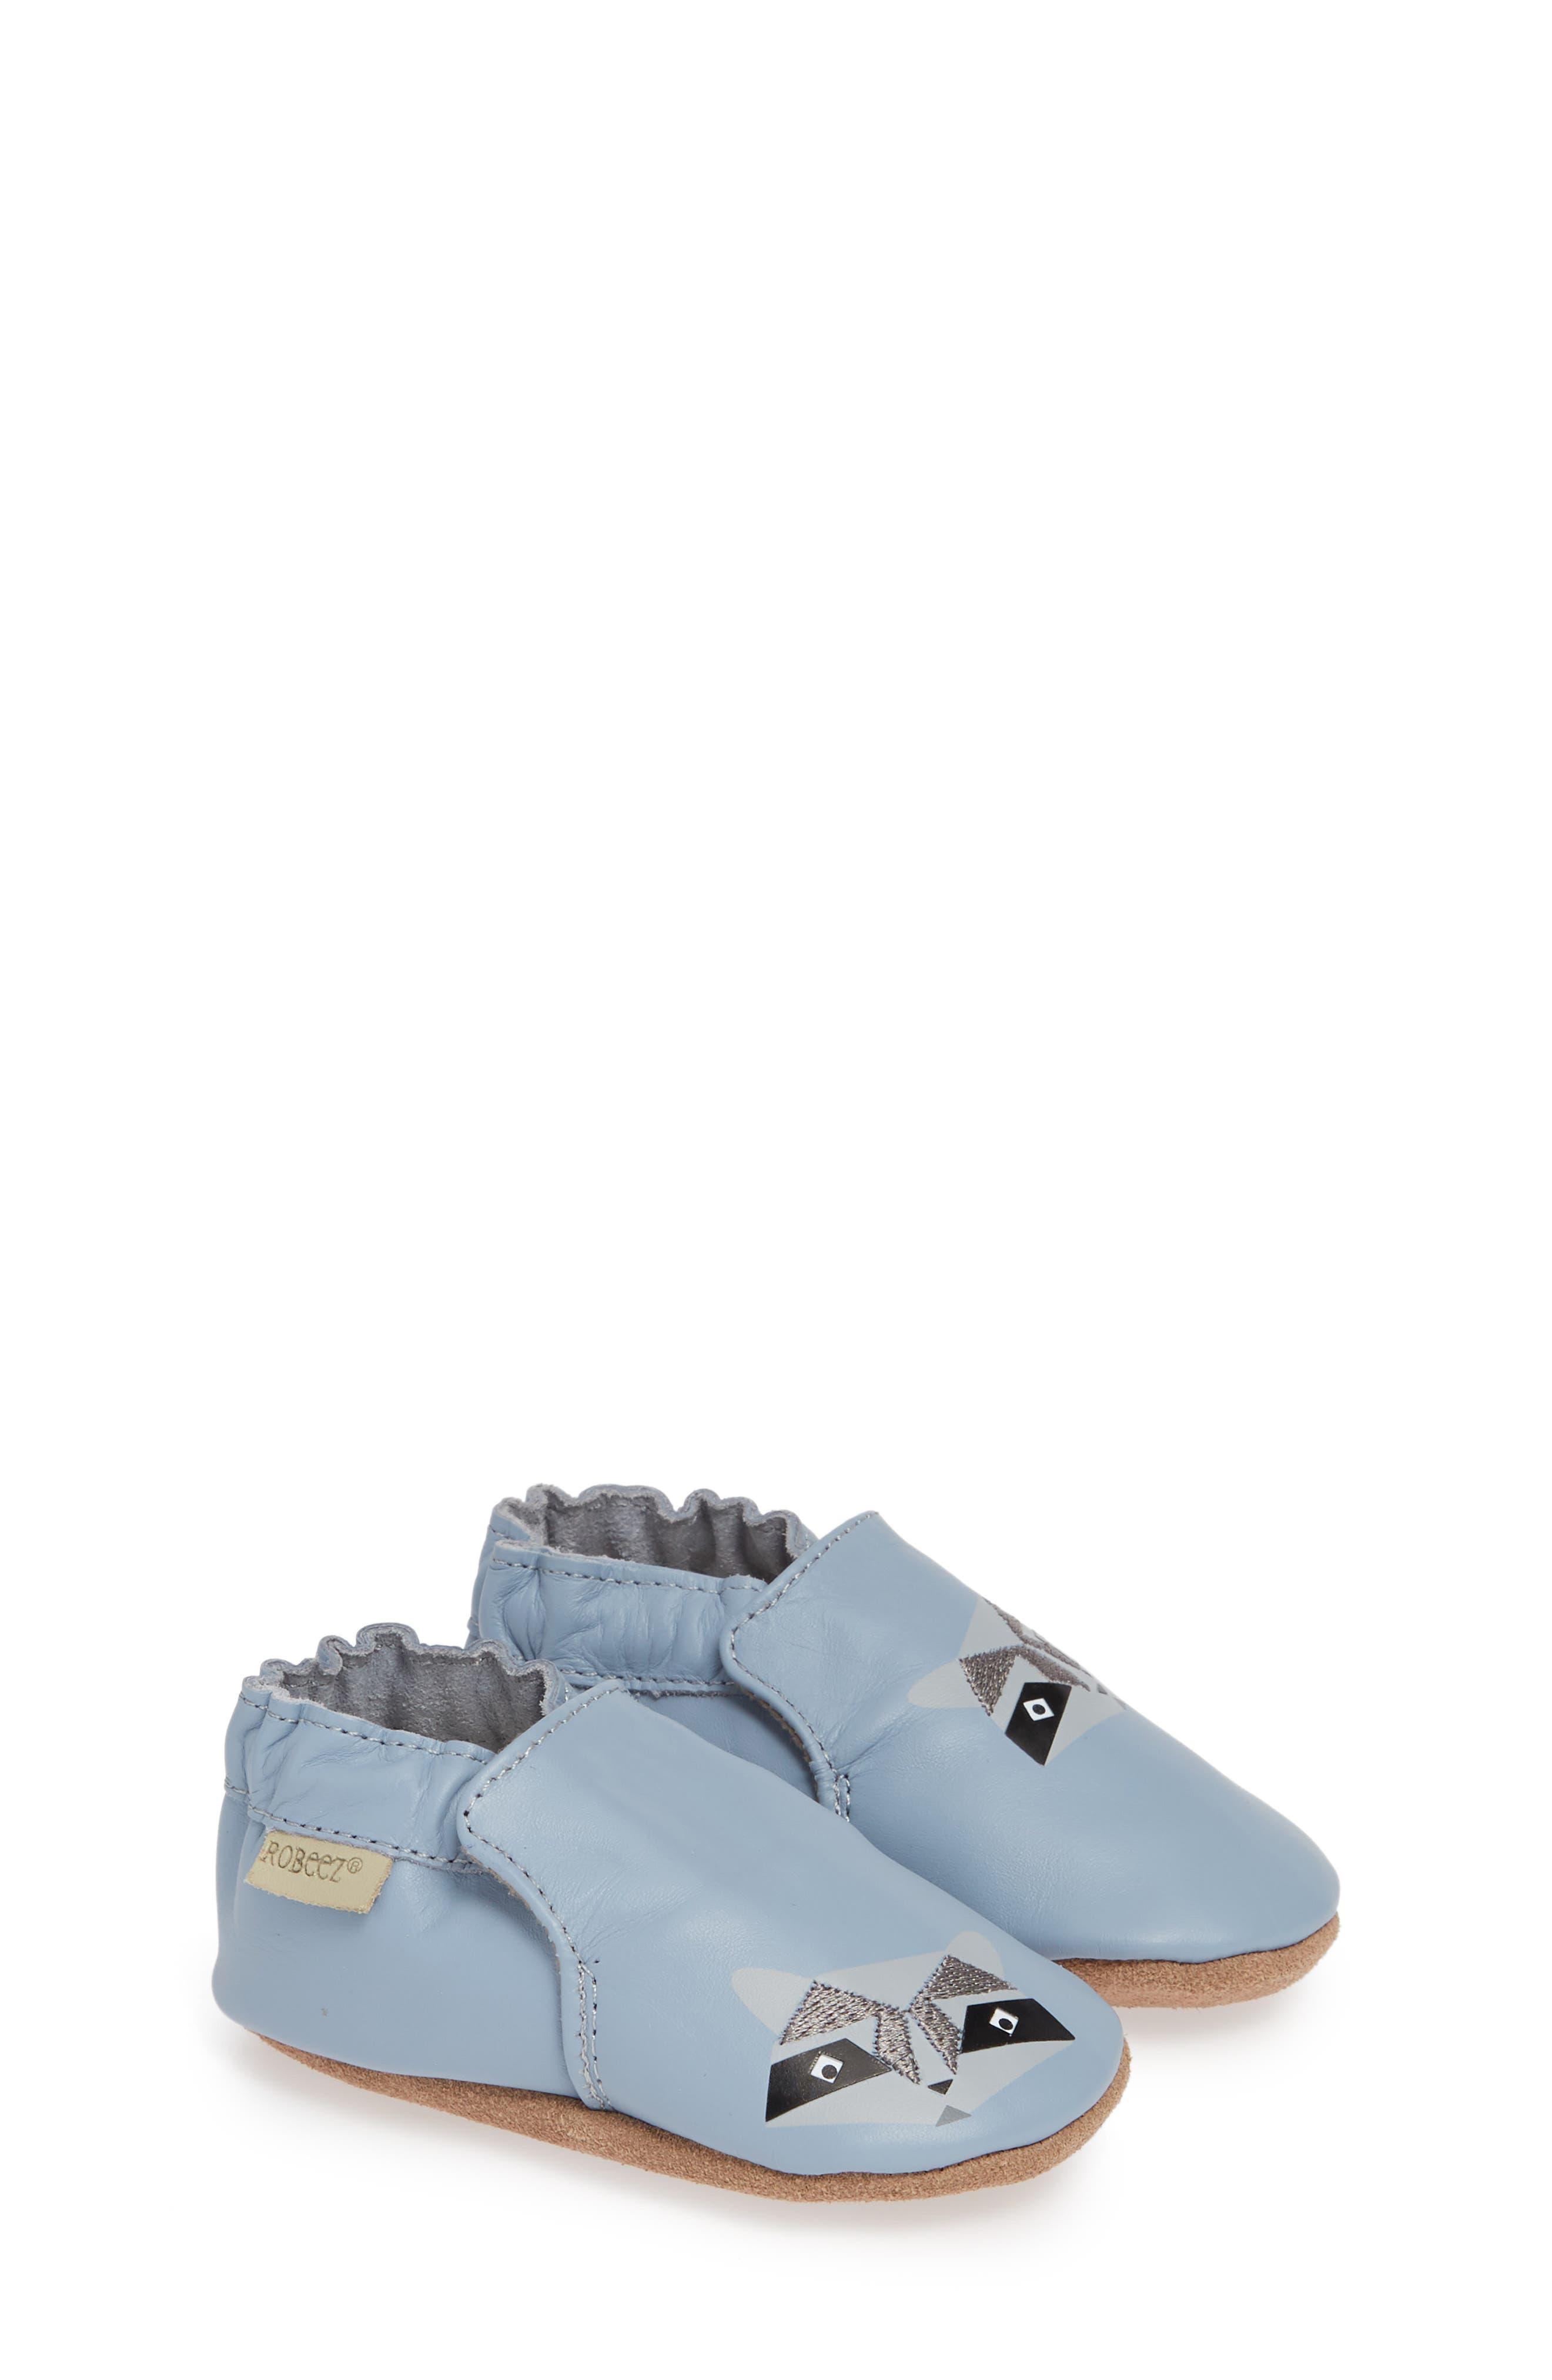 ROBEEZ<SUP>®</SUP> Raccoon Buddies Crib Shoe, Main, color, BLUE